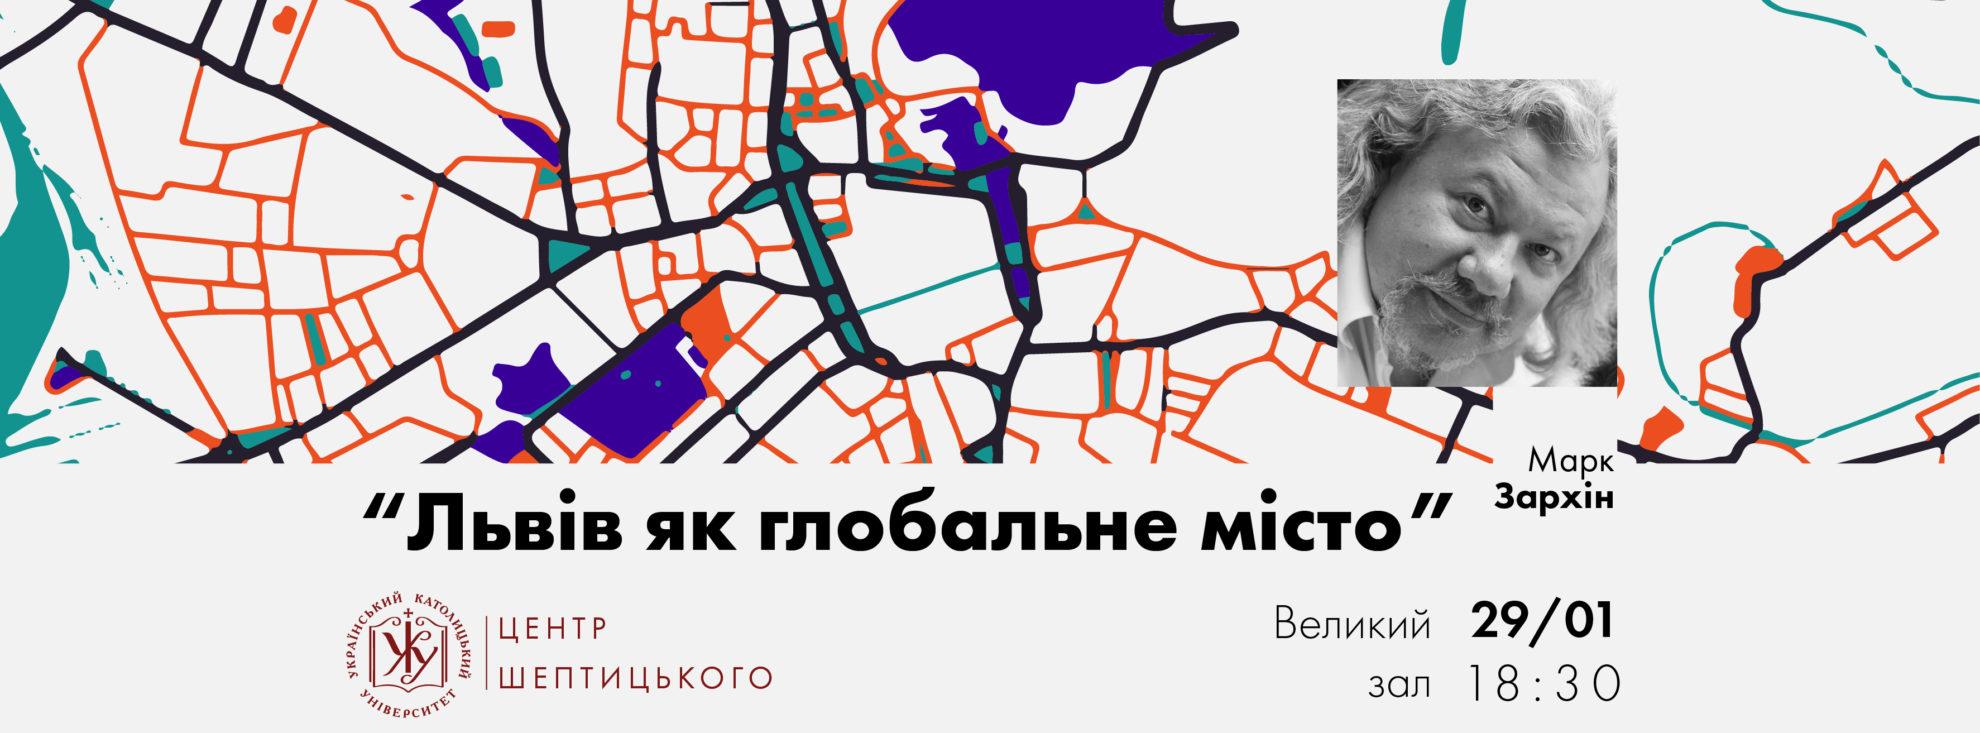 "Лекція Марка Зархіна ""Львів як глобальне місто"""